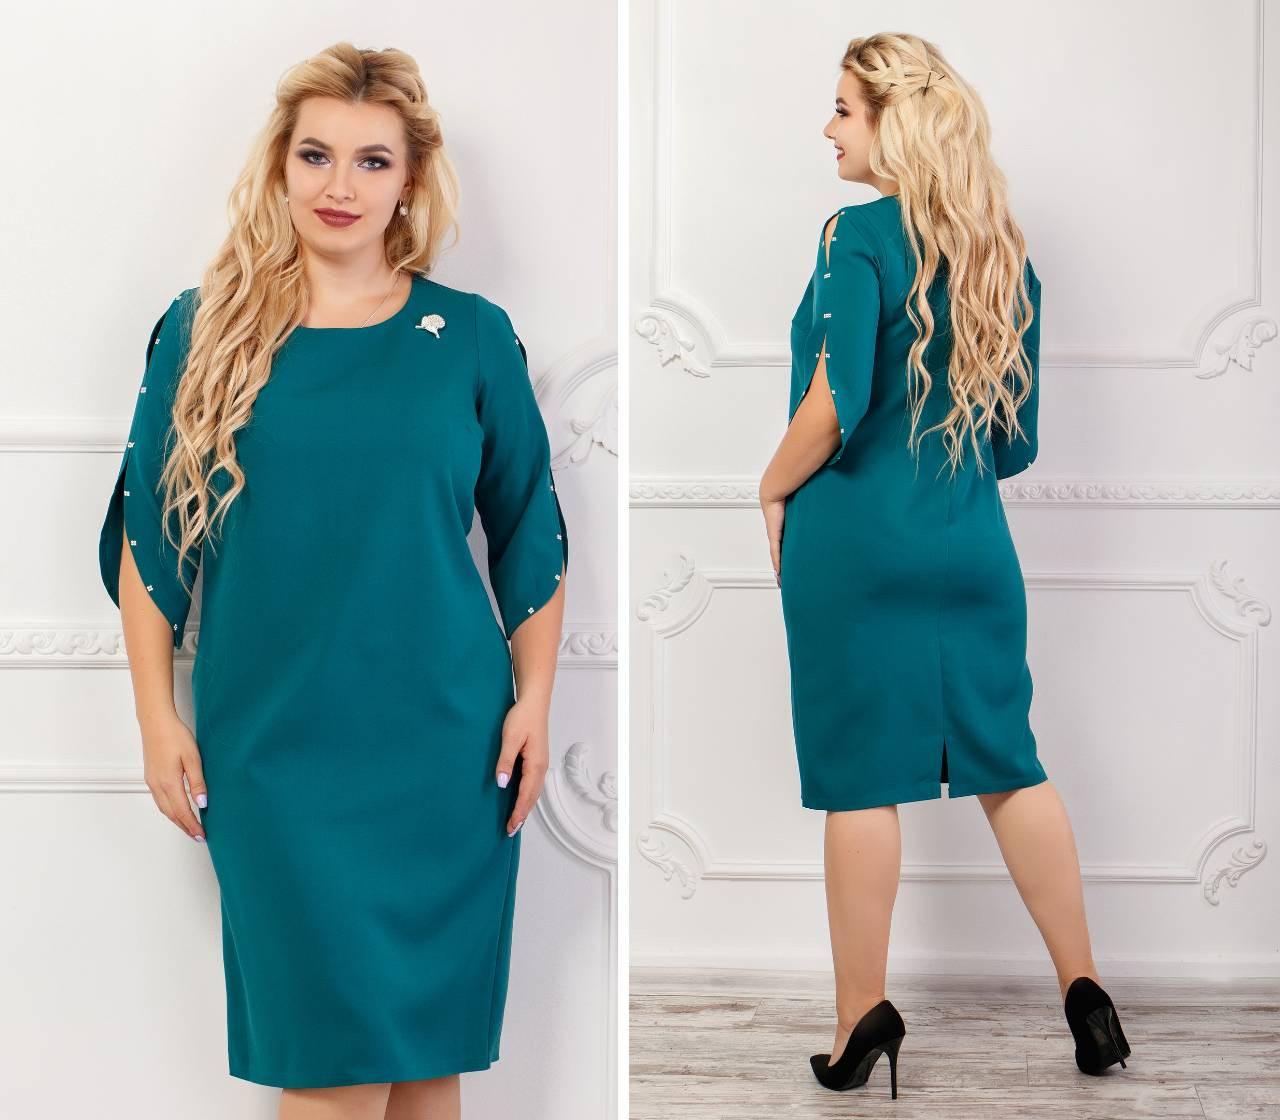 Платье женское с брошкой, креп, модель 130 батал, цвет - аквамарин, 50 размер